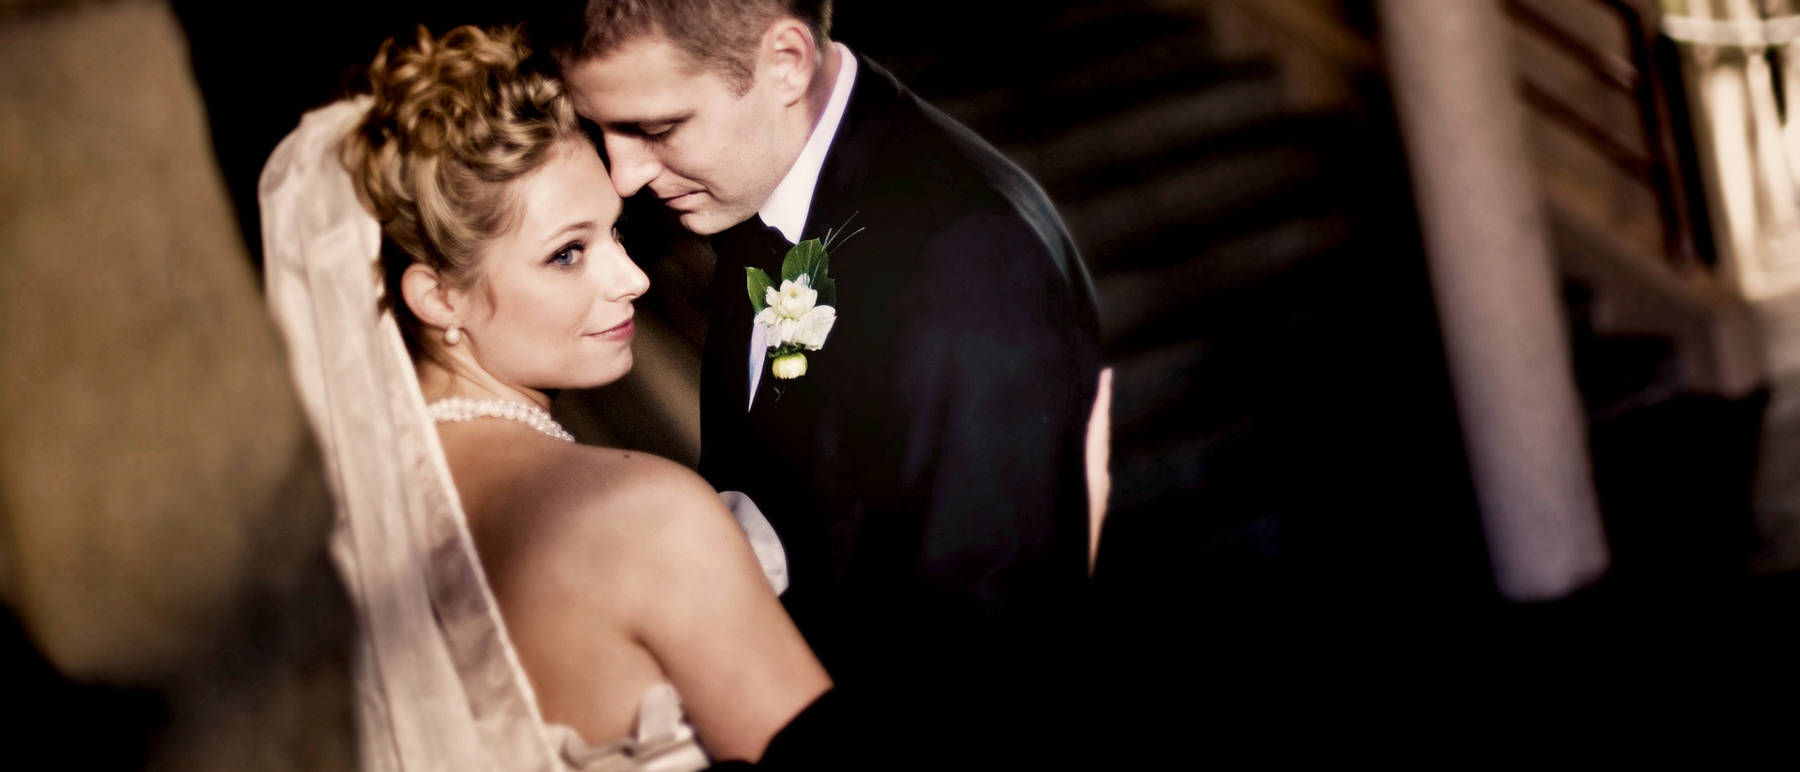 johnandjoseph-wedding-photographer-hz-slider-210